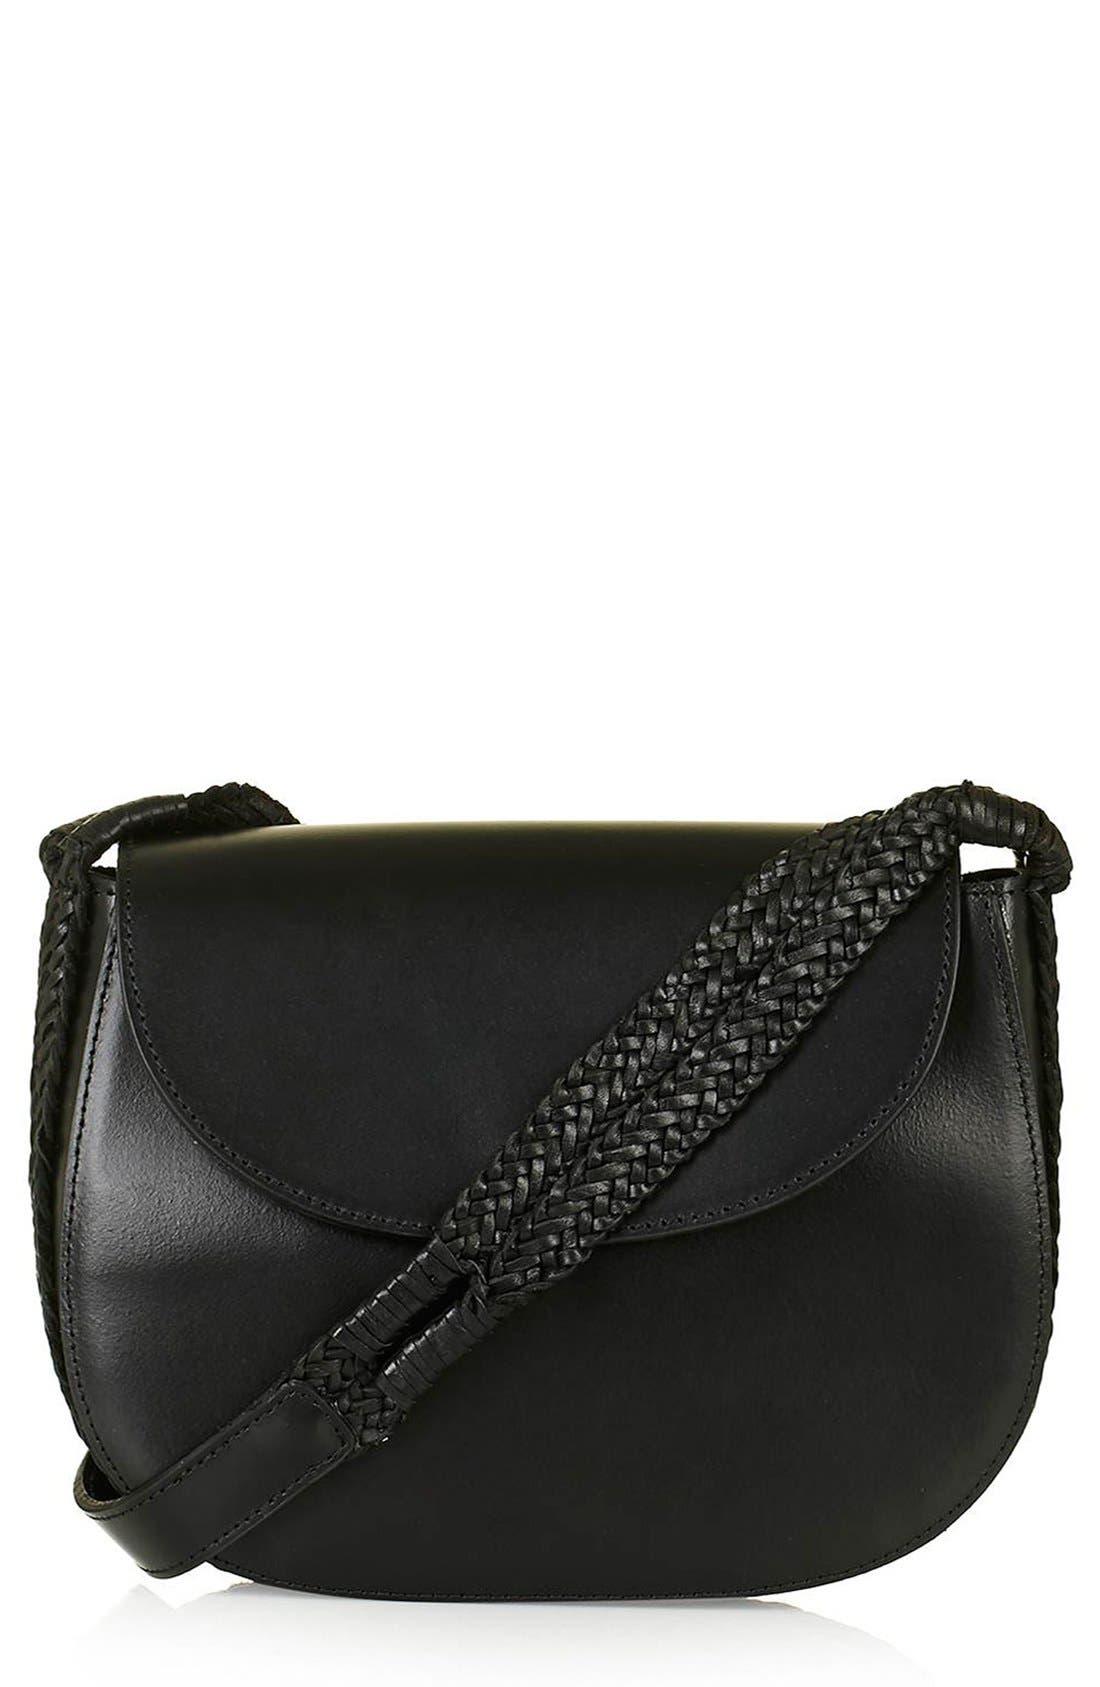 TOPSHOP Woven Strap Leather Saddle Bag, Main, color, 001